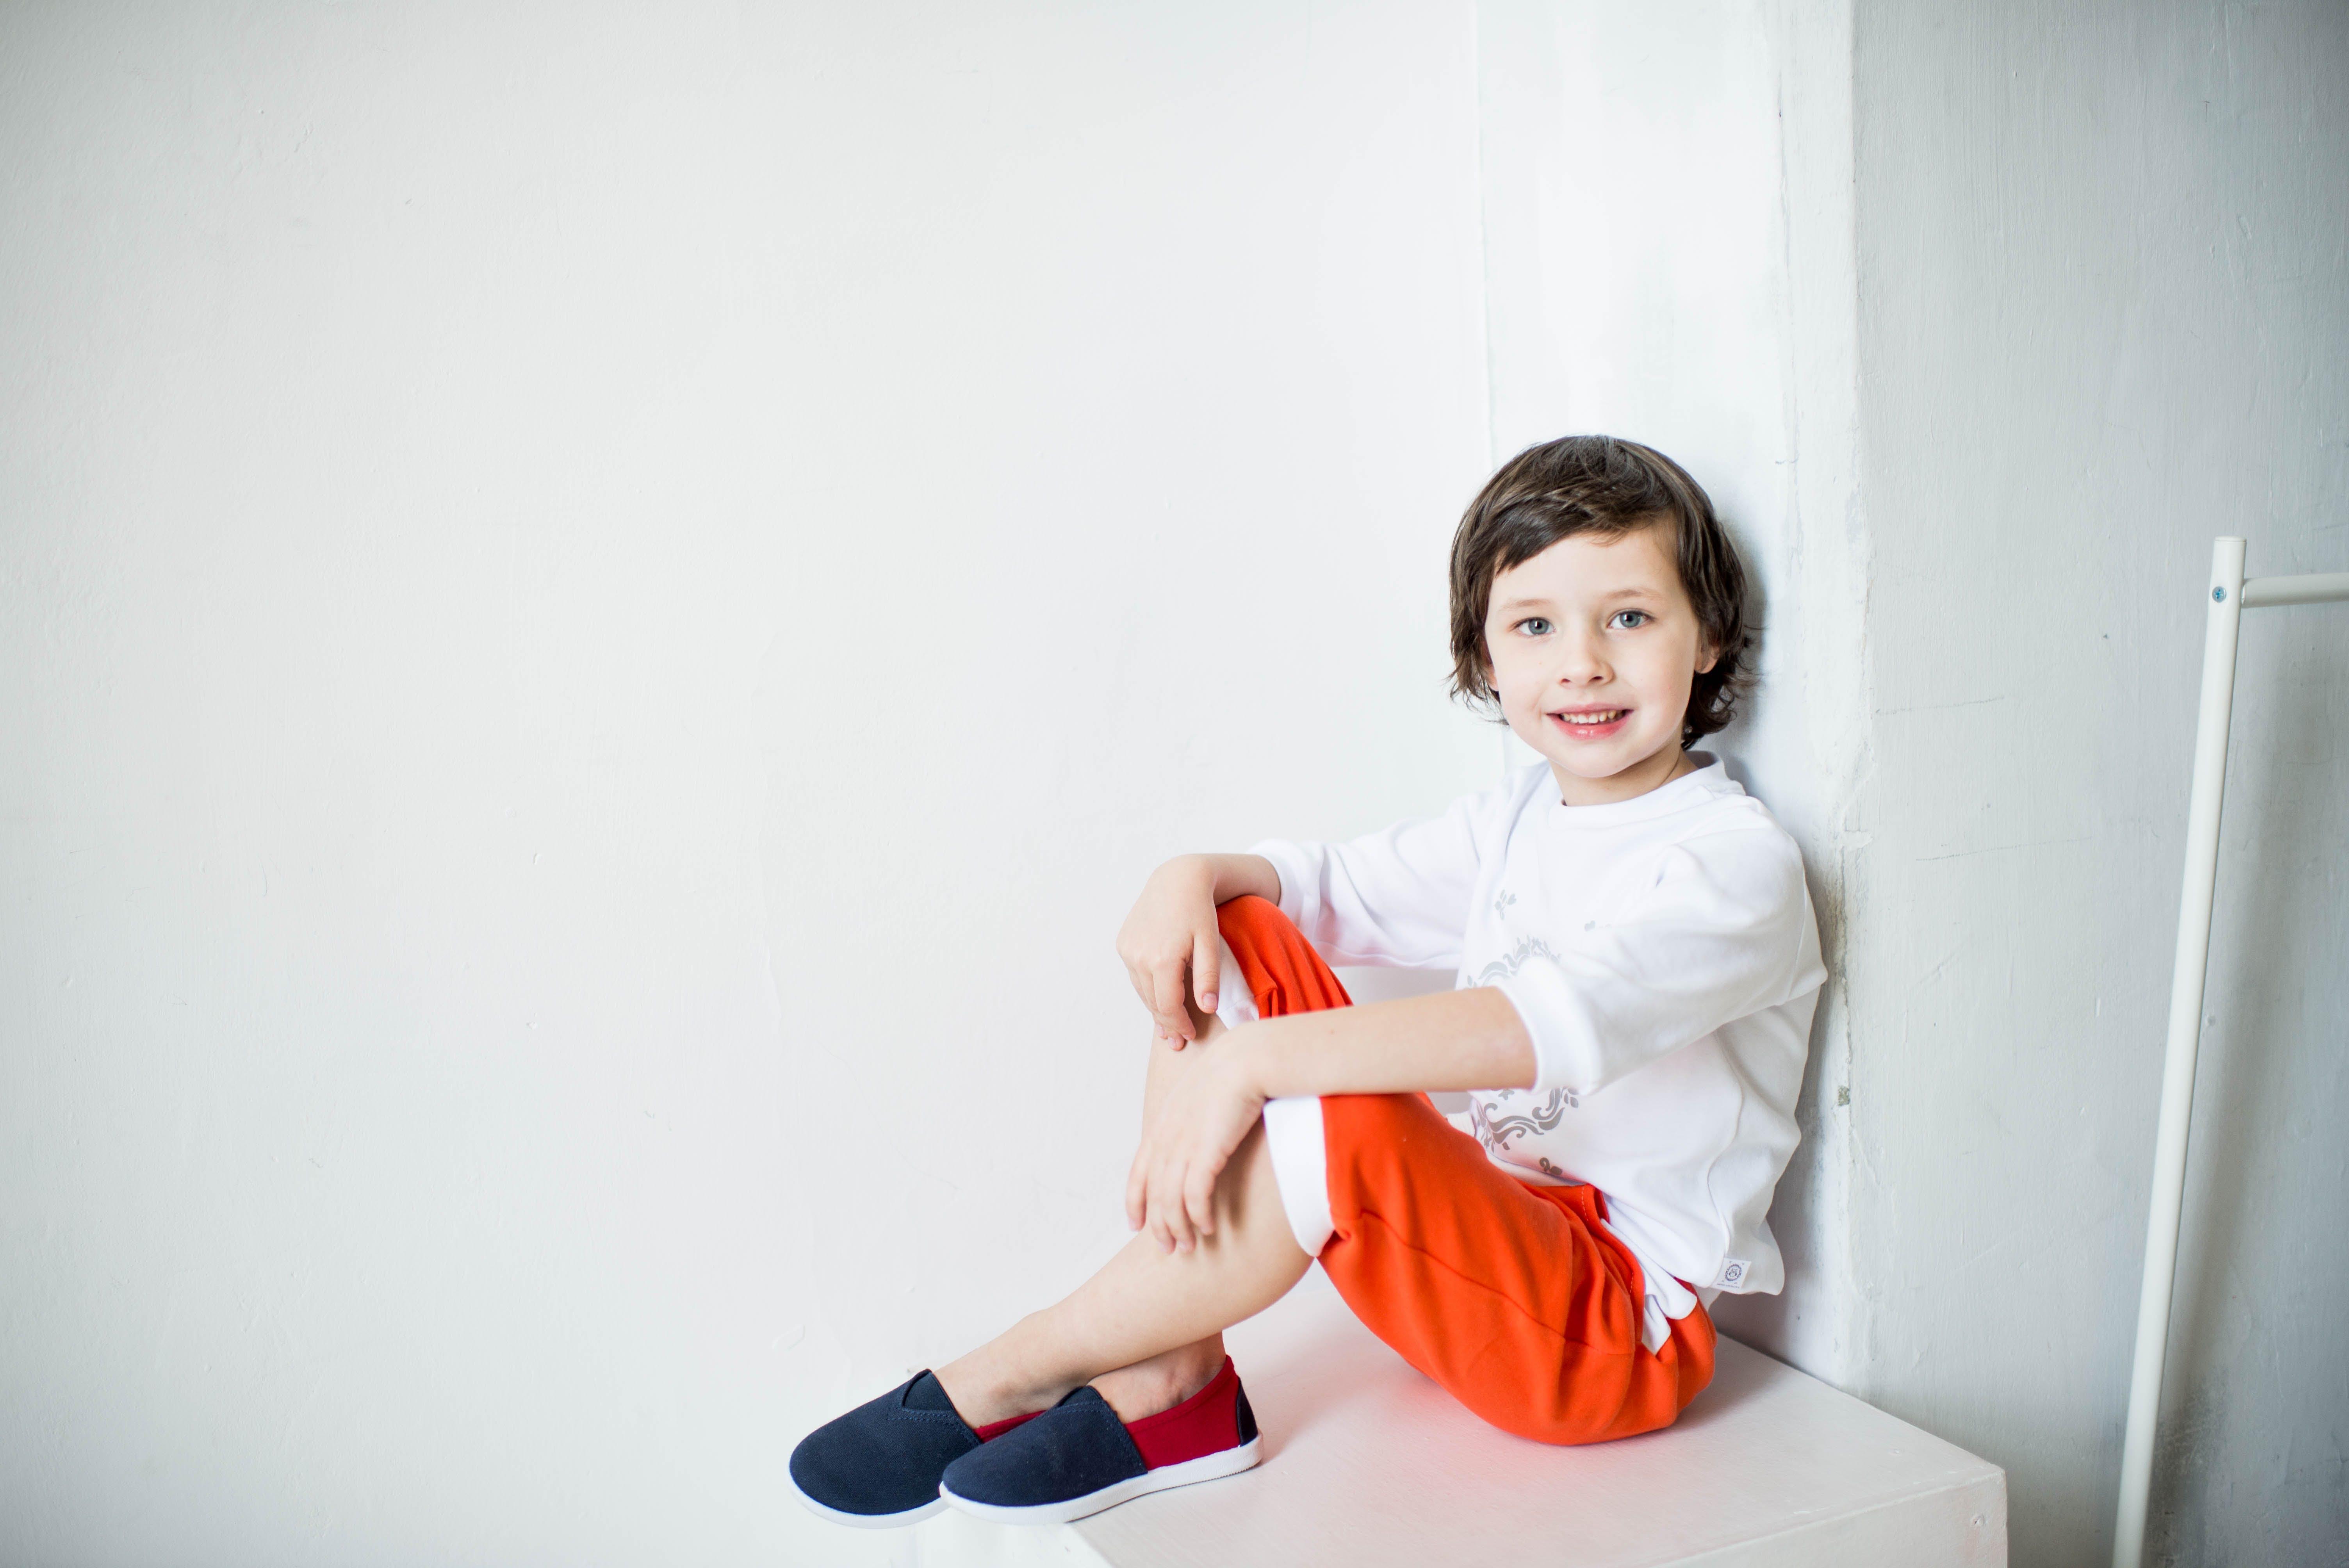 Photo of Smiling Boy Sitting